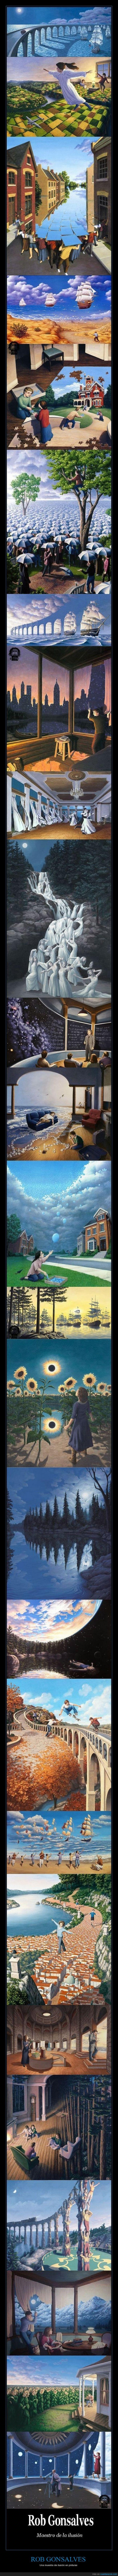 ilusion,ilusion optima,mundo,pintura,rob gonsalves,surrealista